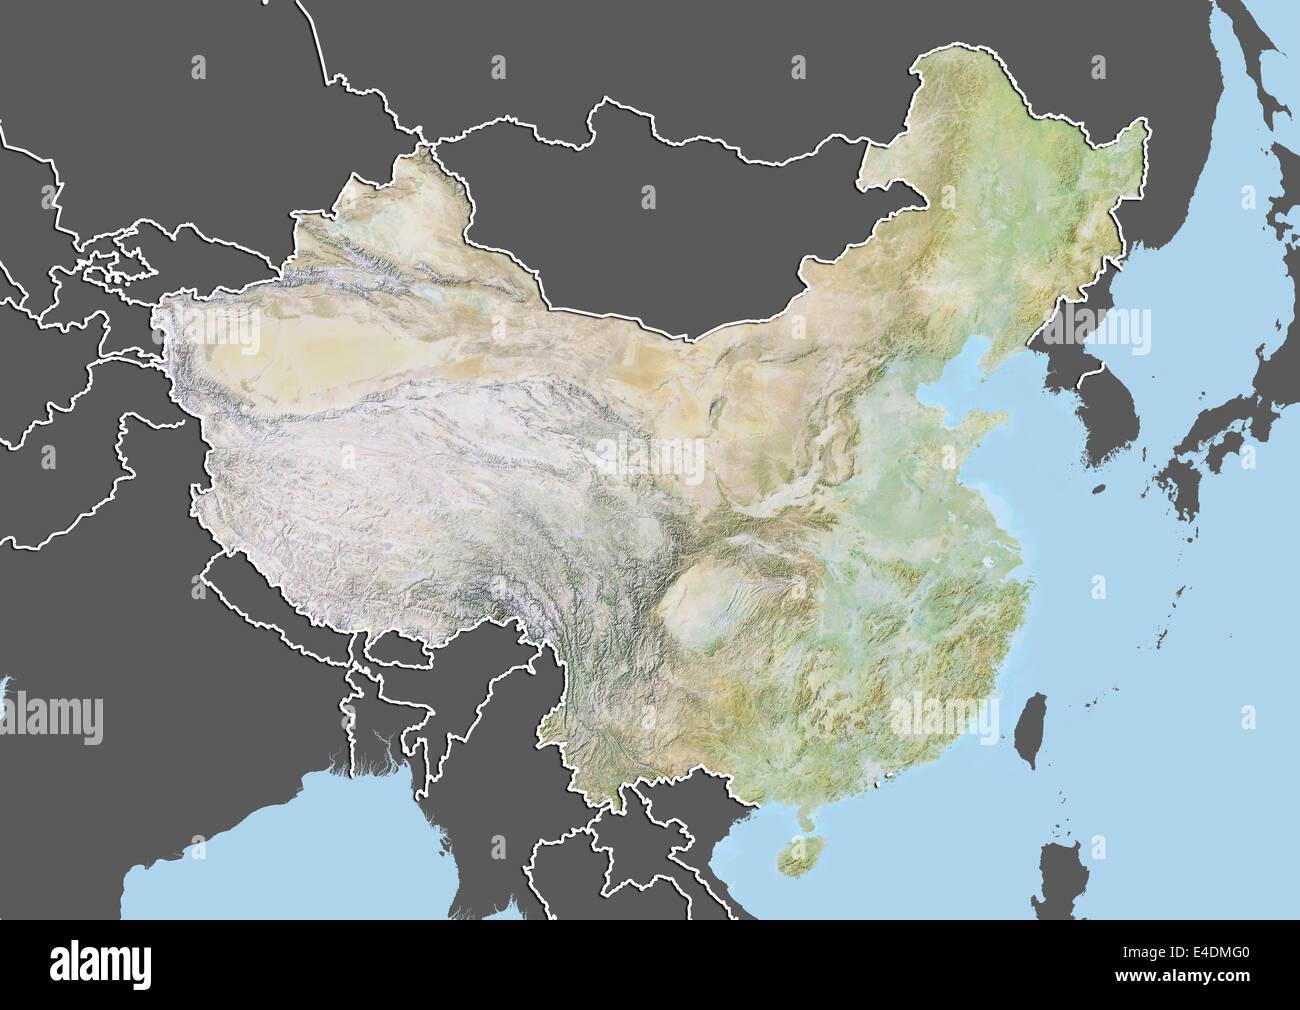 Shanghai China Map on